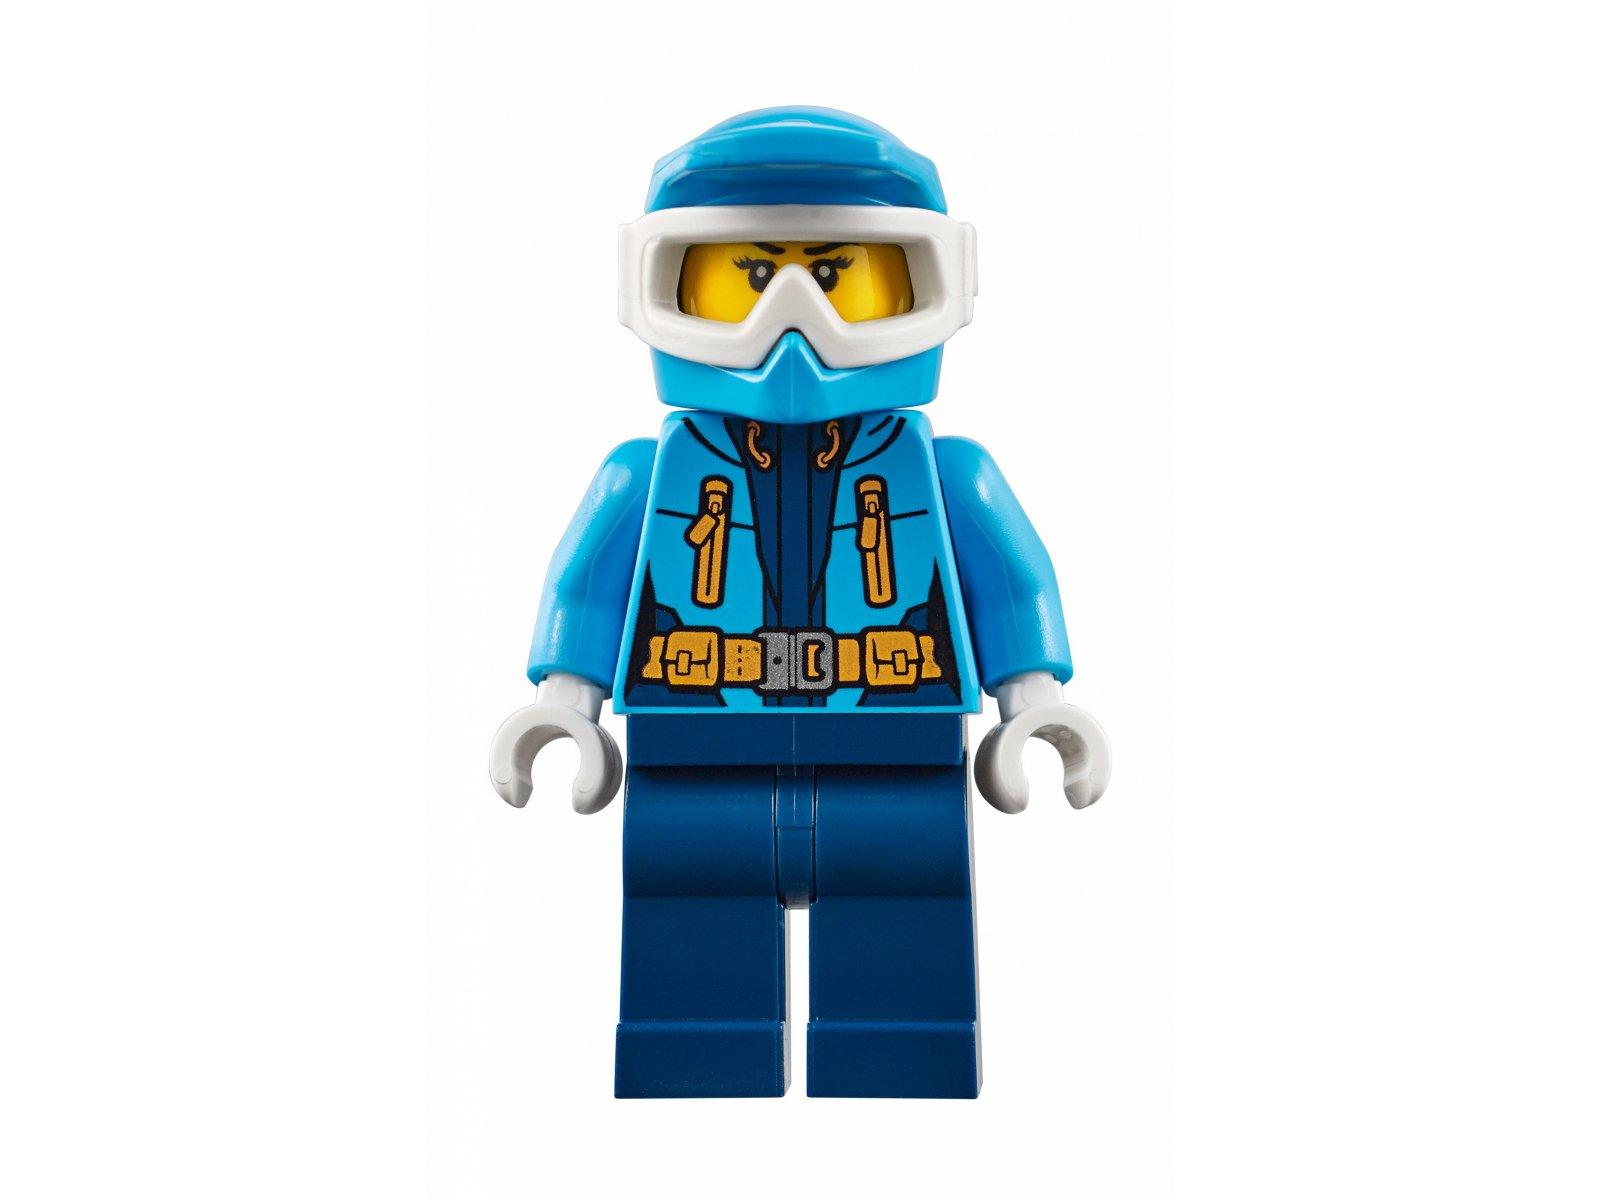 LEGO 60195 City Arktyczna baza mobilna